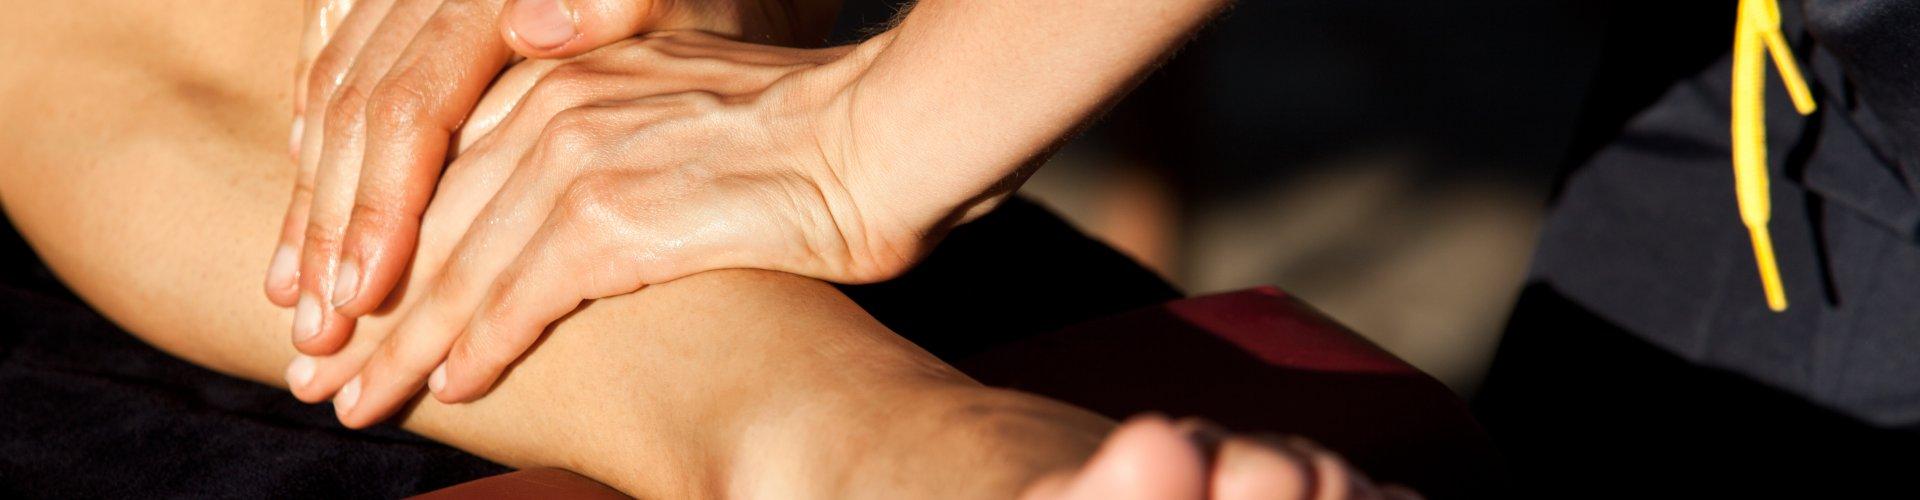 Opleiding sportmassage hoorn alkmaar